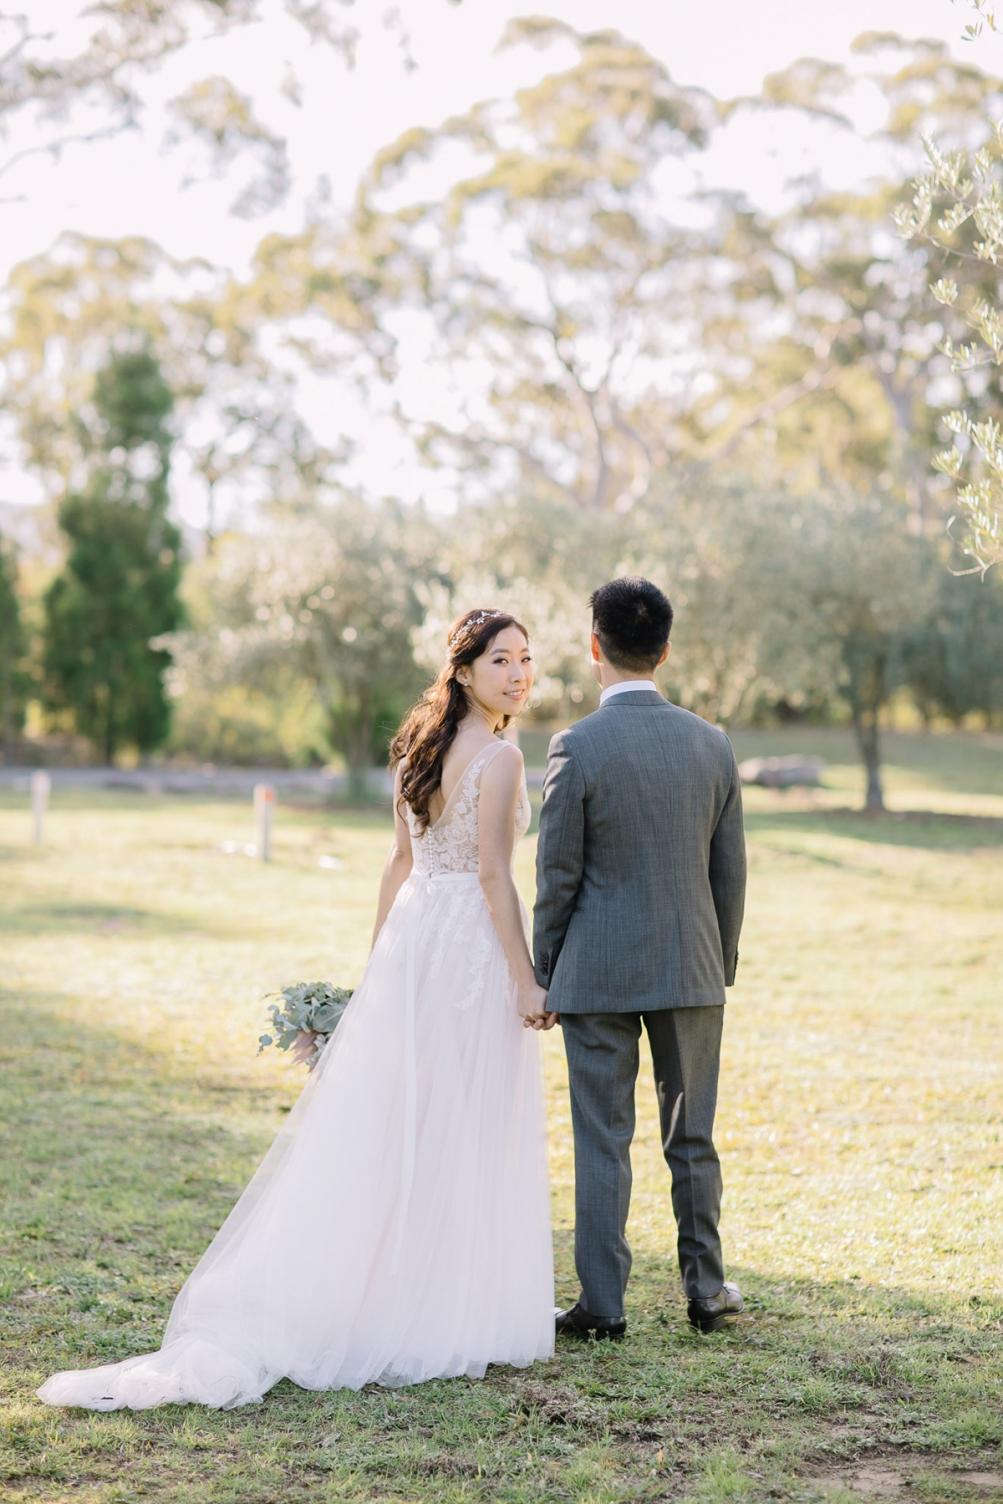 jess-andrew-kangaroo-valley-wedding088